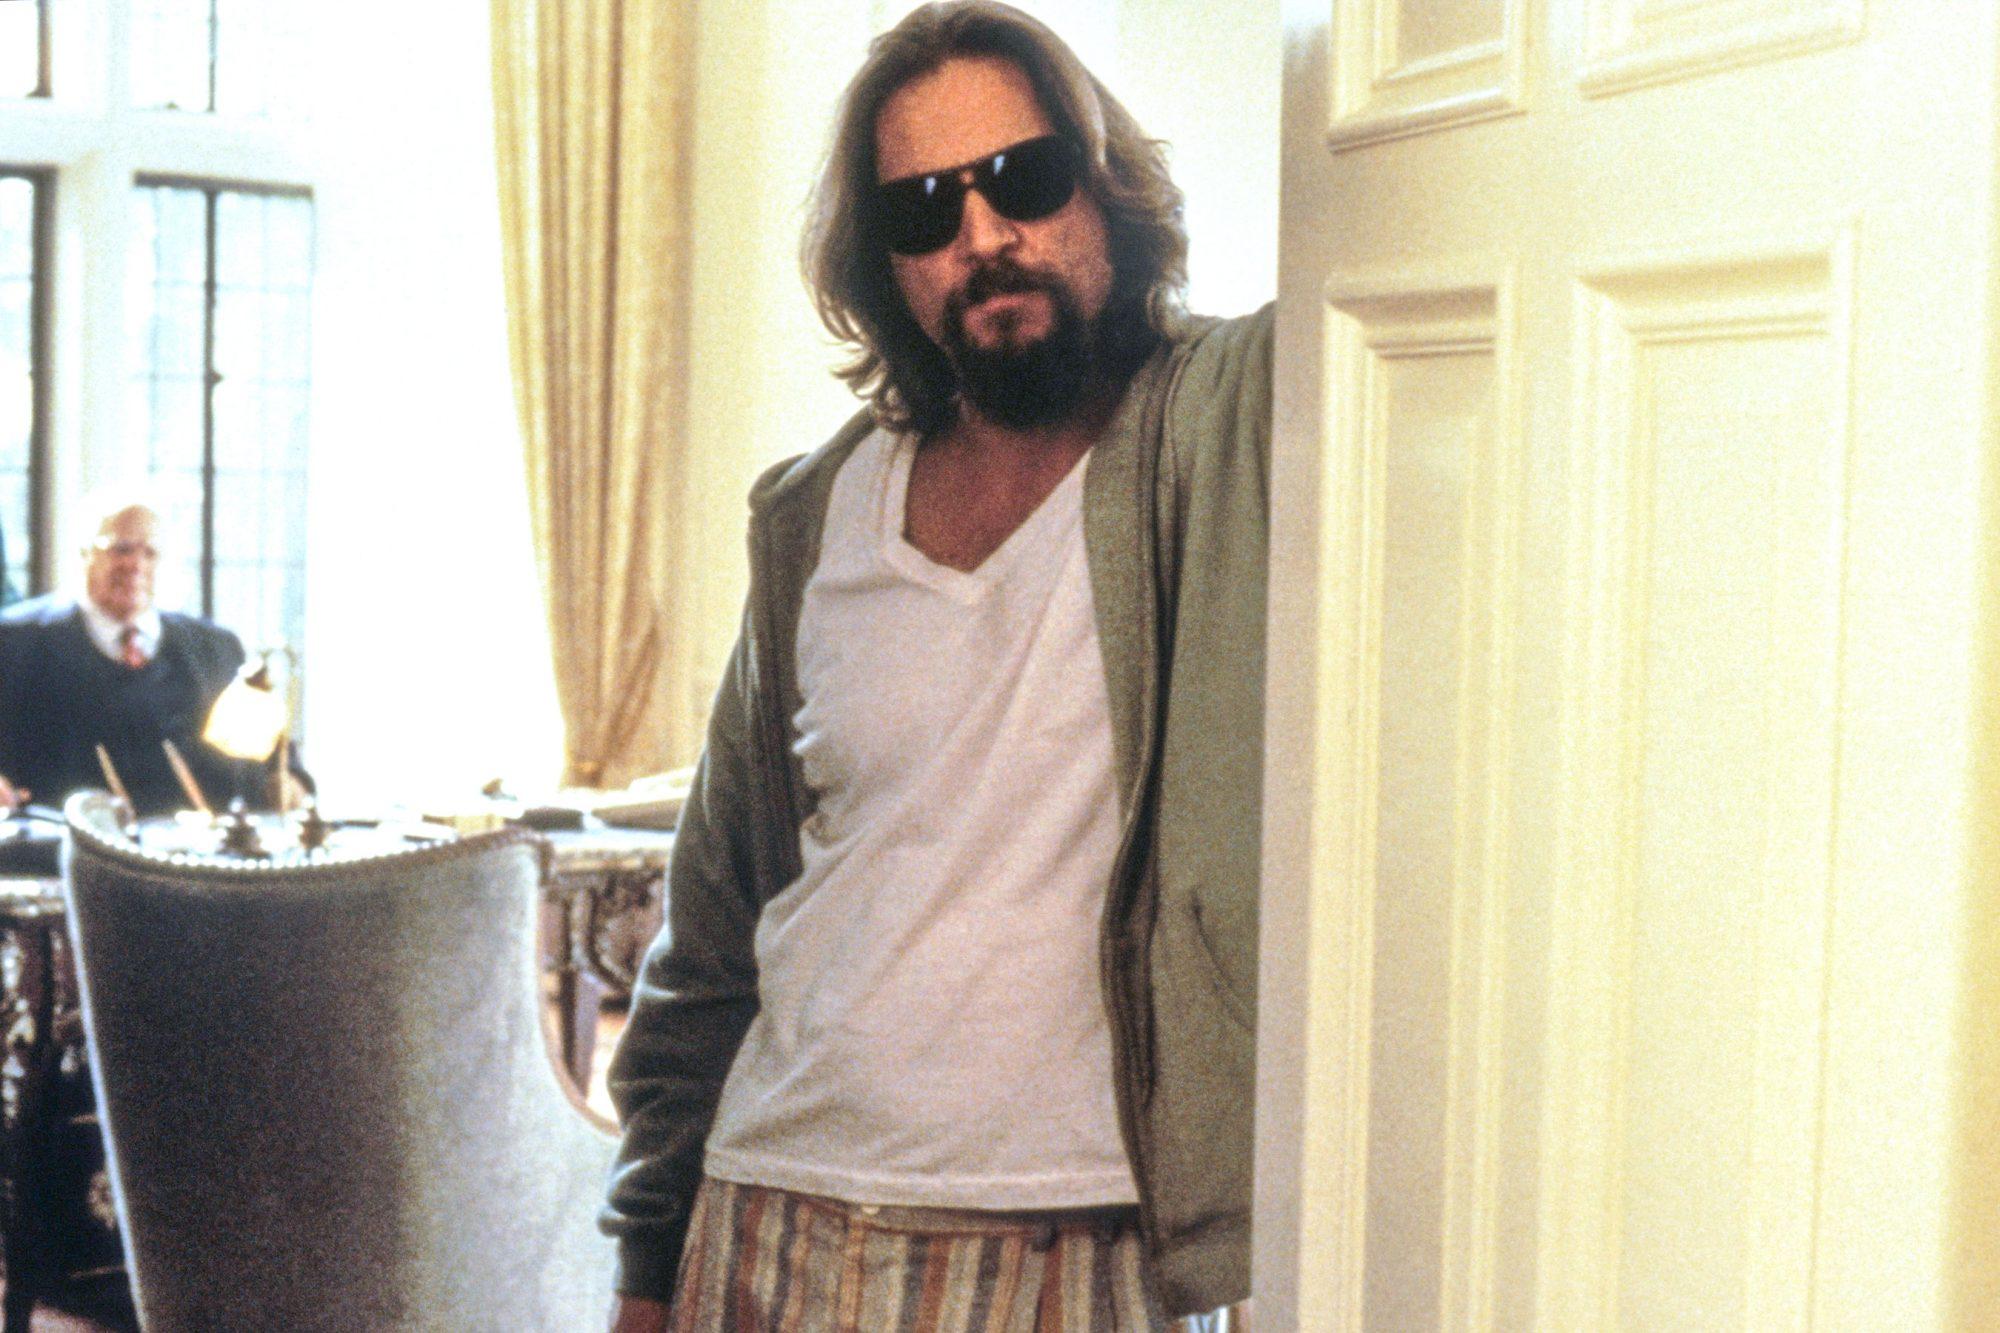 THE BIG LEBOWSKI, Jeff Bridges, David Huddleston (rear), 1998, © Gramercy Pictures/courtesy Everett